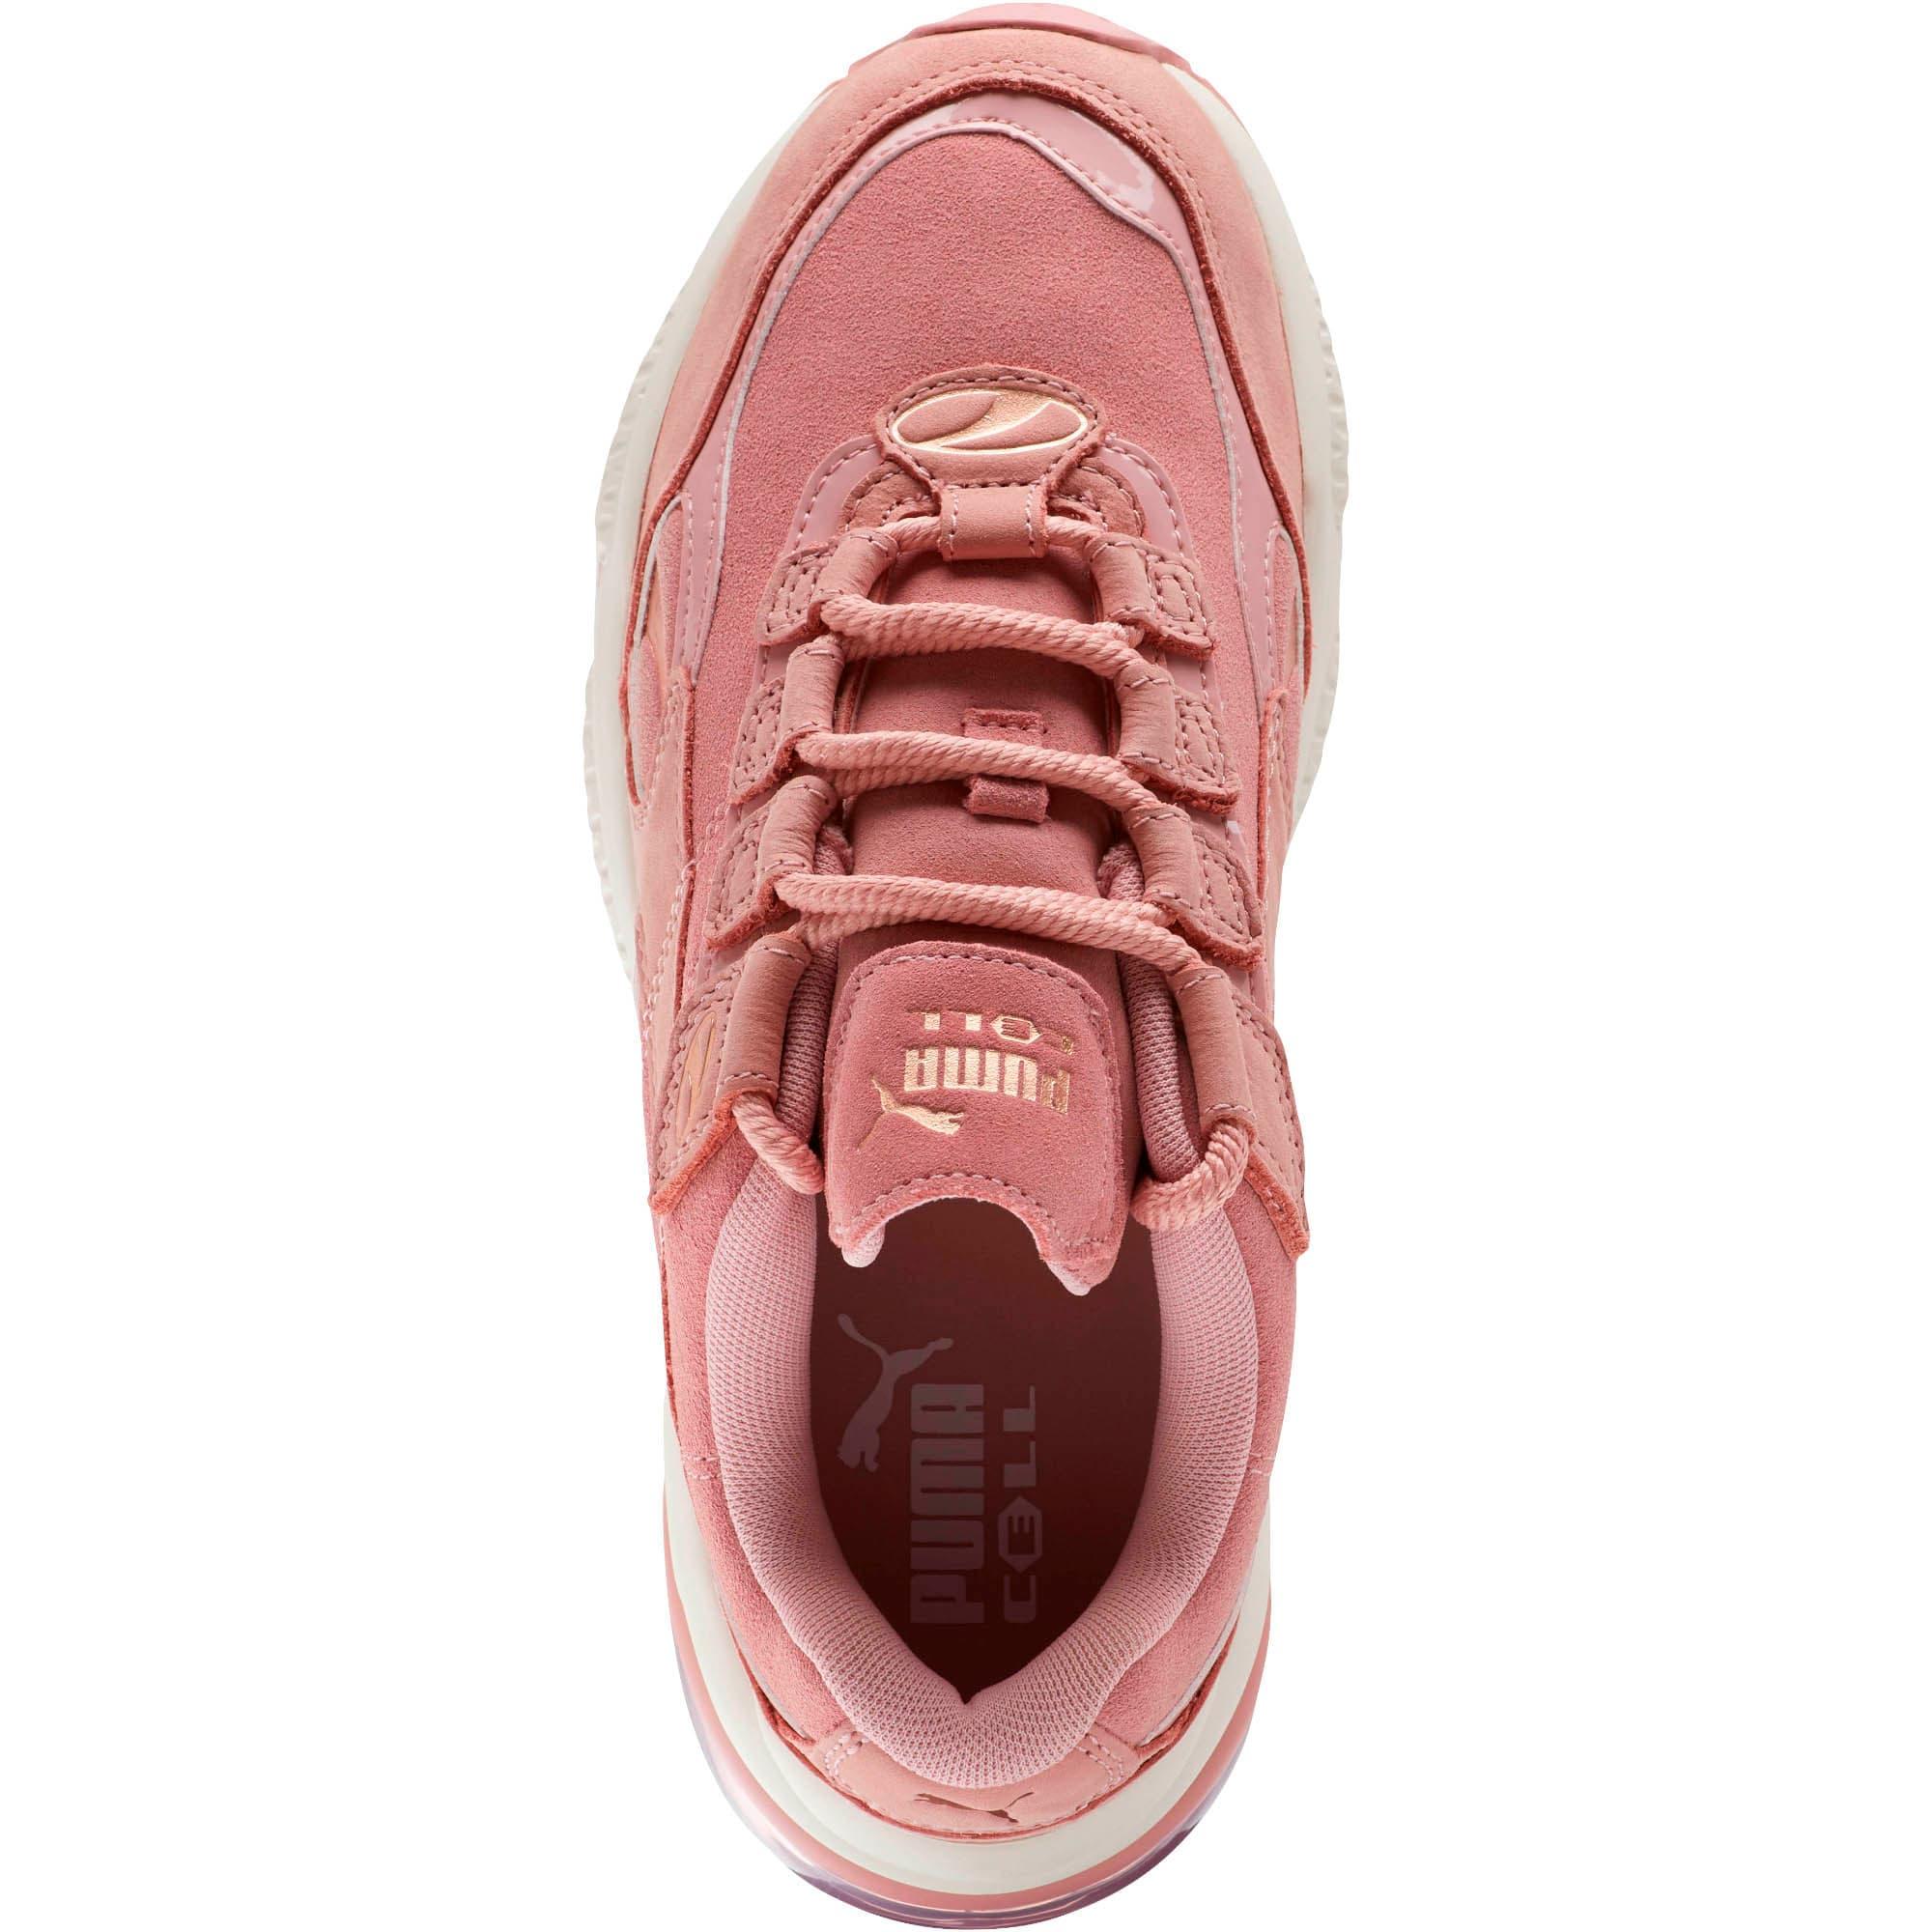 Thumbnail 5 of CELL Venom Patent Women's Sneakers, Bridal Rose-Marshmallow, medium